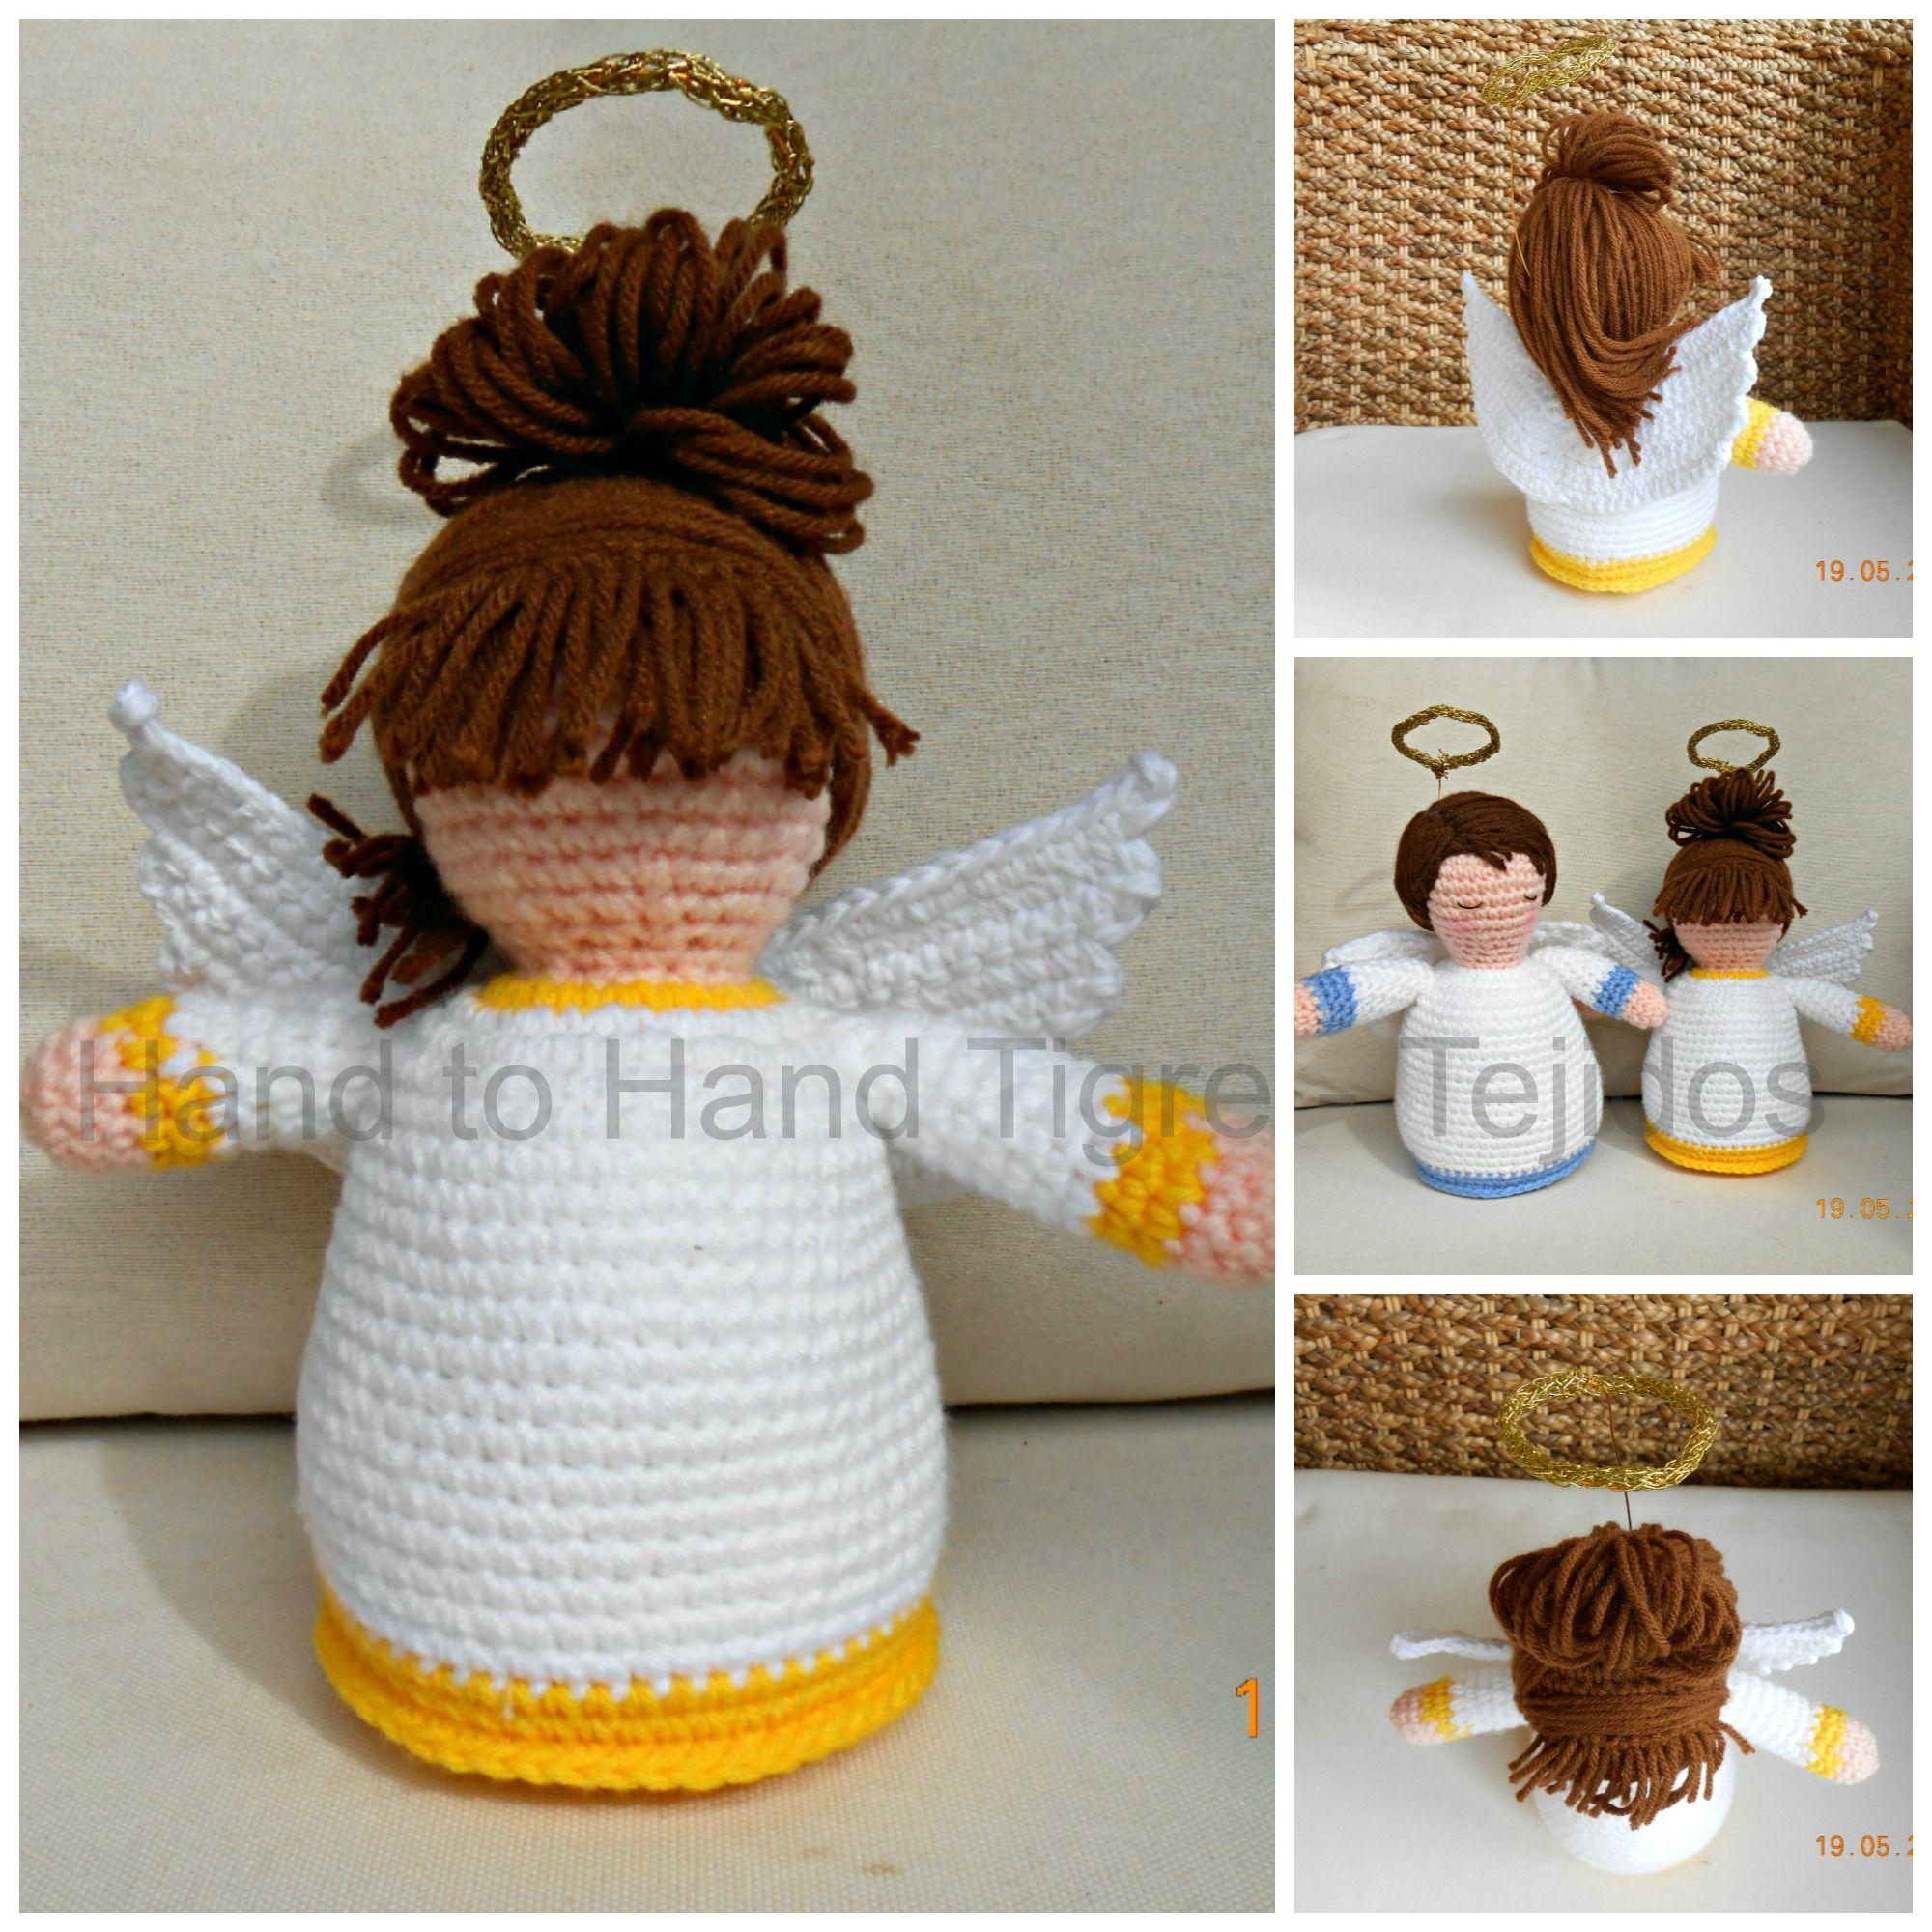 Amigurumi Angel Girl - by Hand to Hand Tigre - Tejidos. https://www.facebook.com/photo.php?fbid=462199407201157=a.356288284458937.88856.356270324460733=1